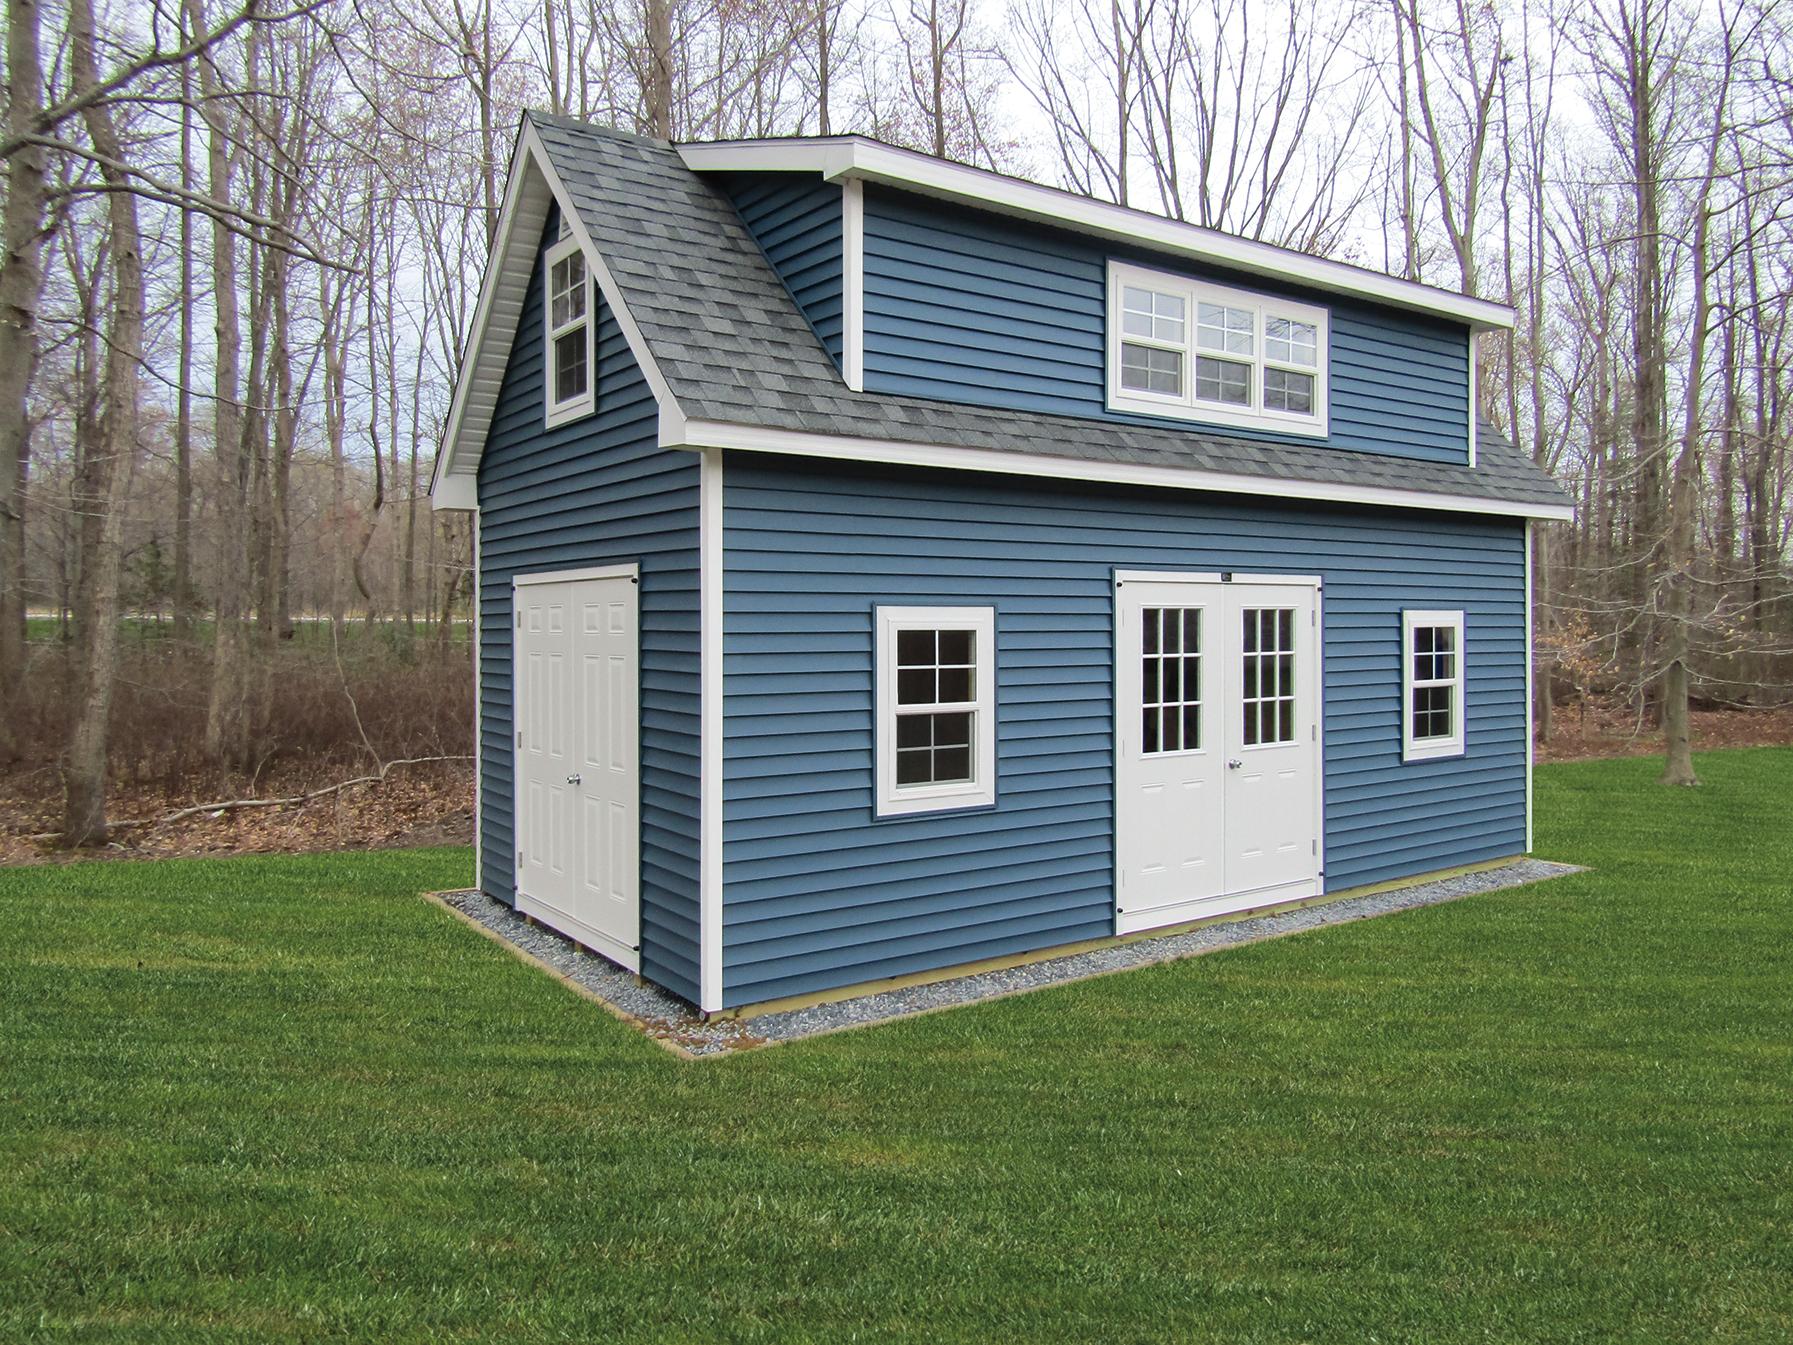 12 x 24 2 story 1 car garage with Full Dormer